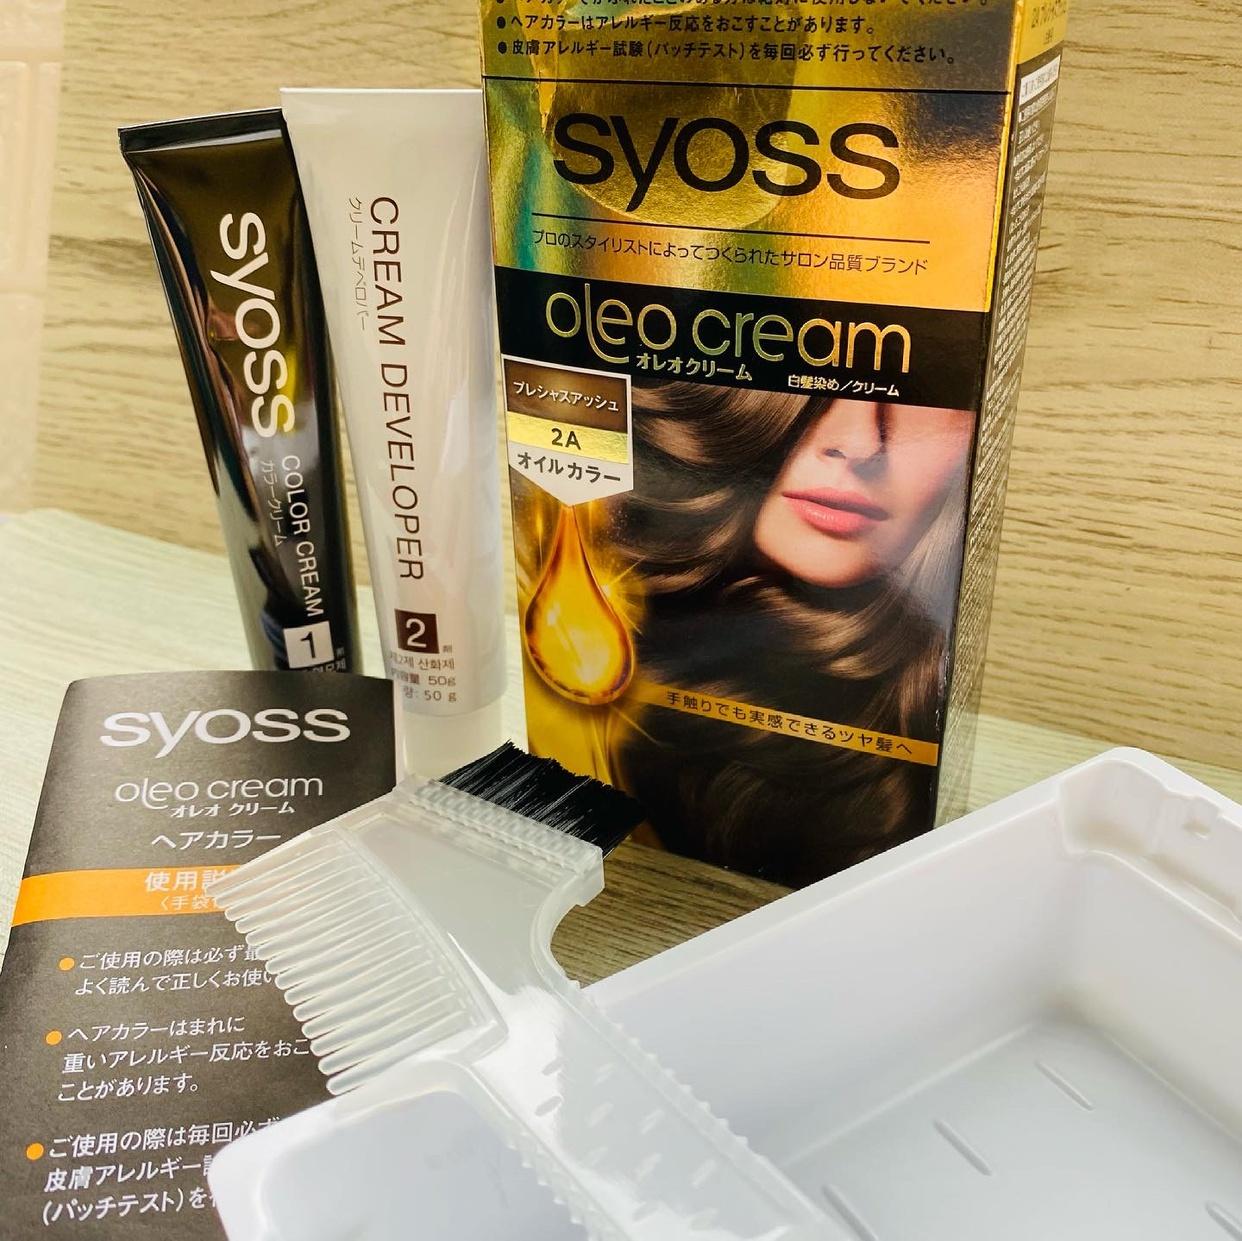 syoss(サイオス)オレオクリームを使ったマイピコブーさんのクチコミ画像2